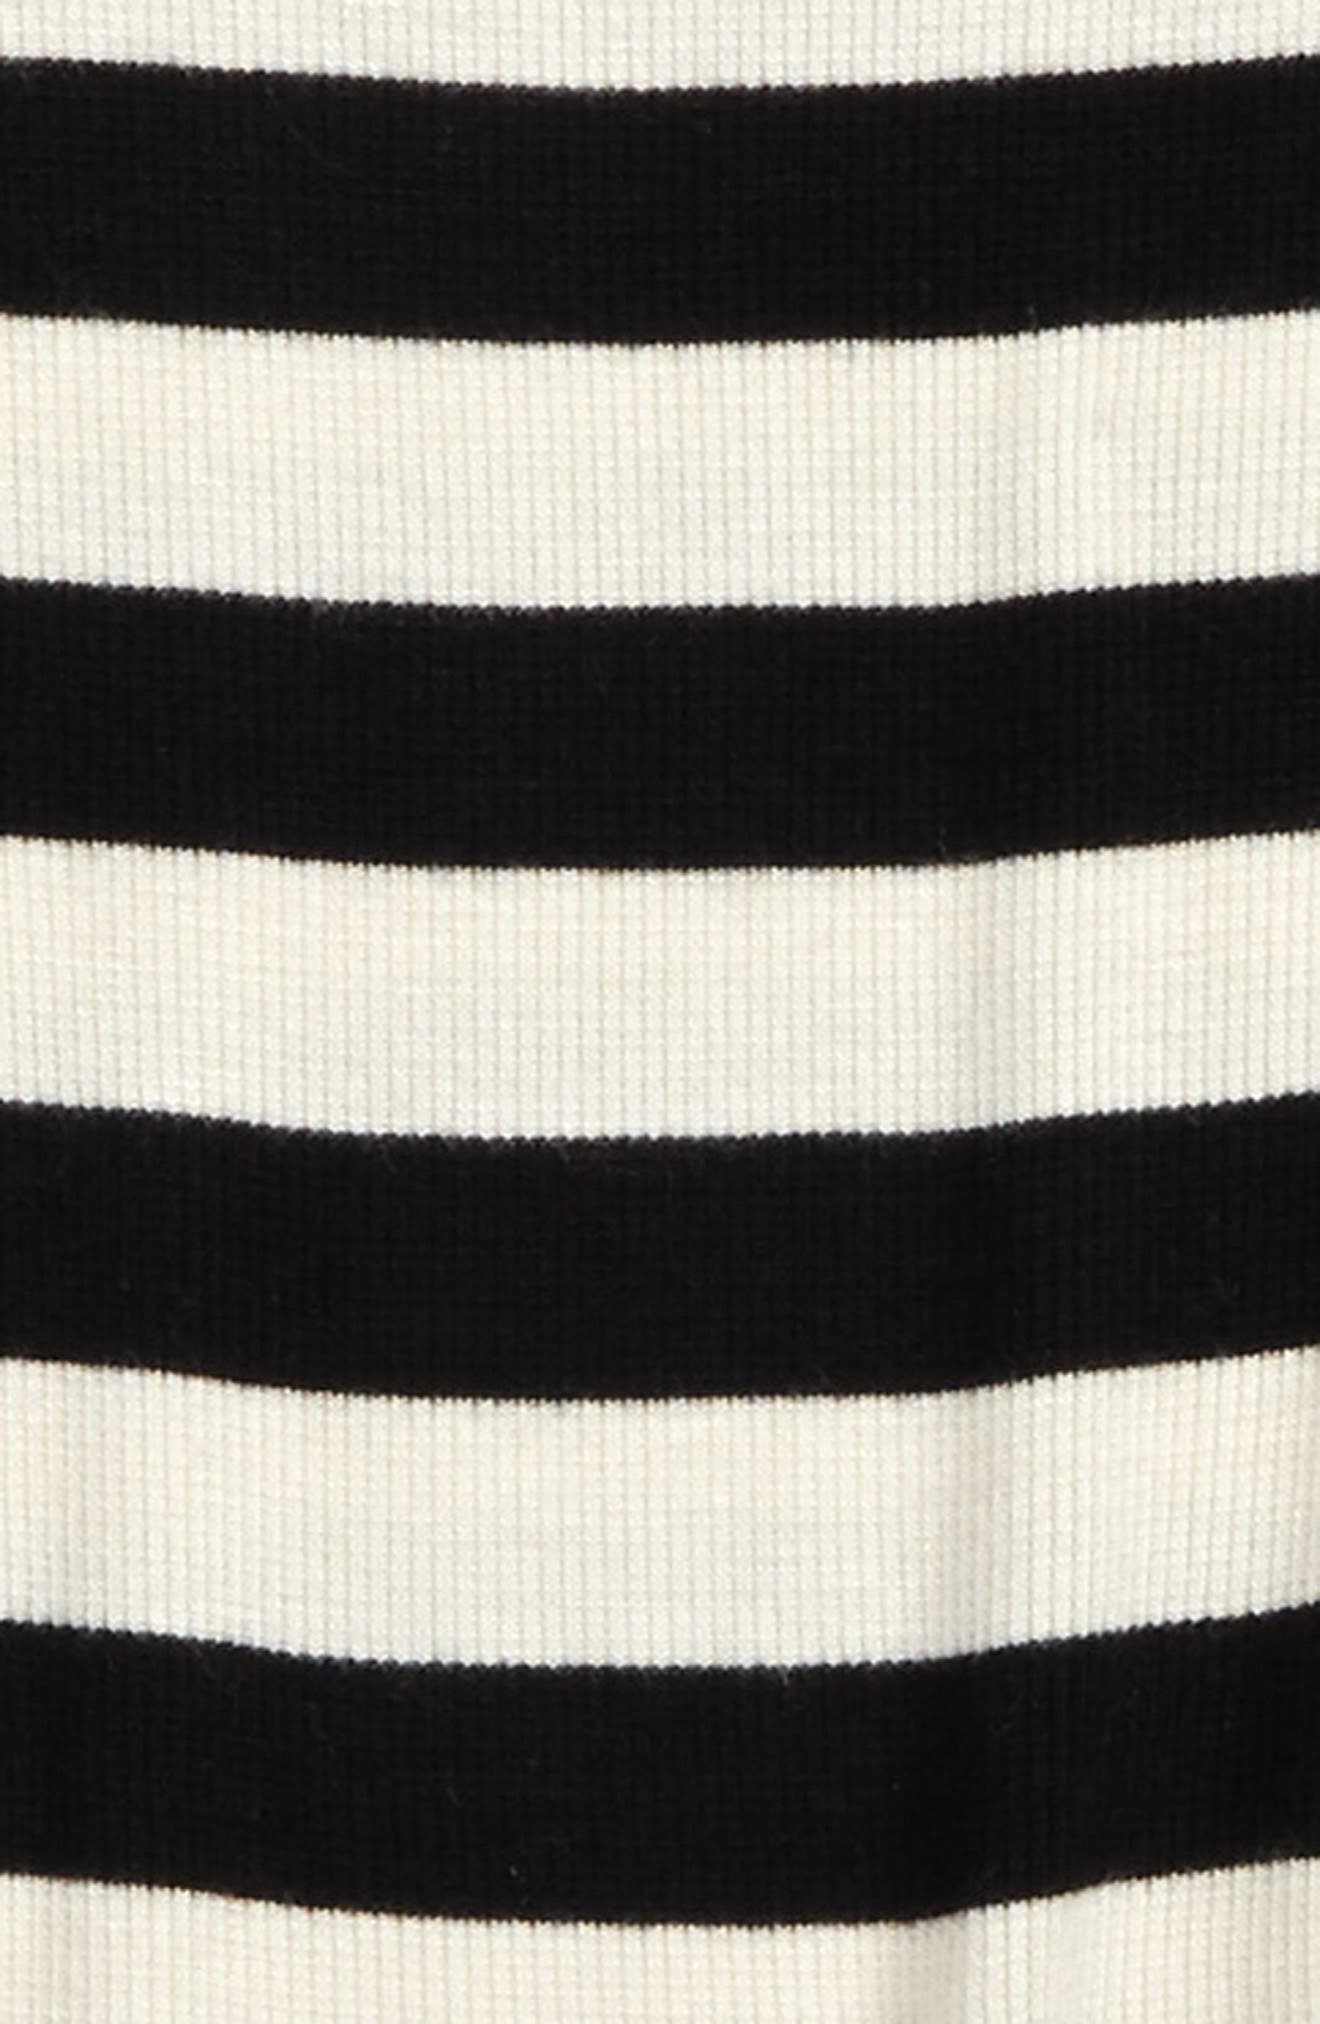 Merrow Edge Stripe Tee,                             Alternate thumbnail 2, color,